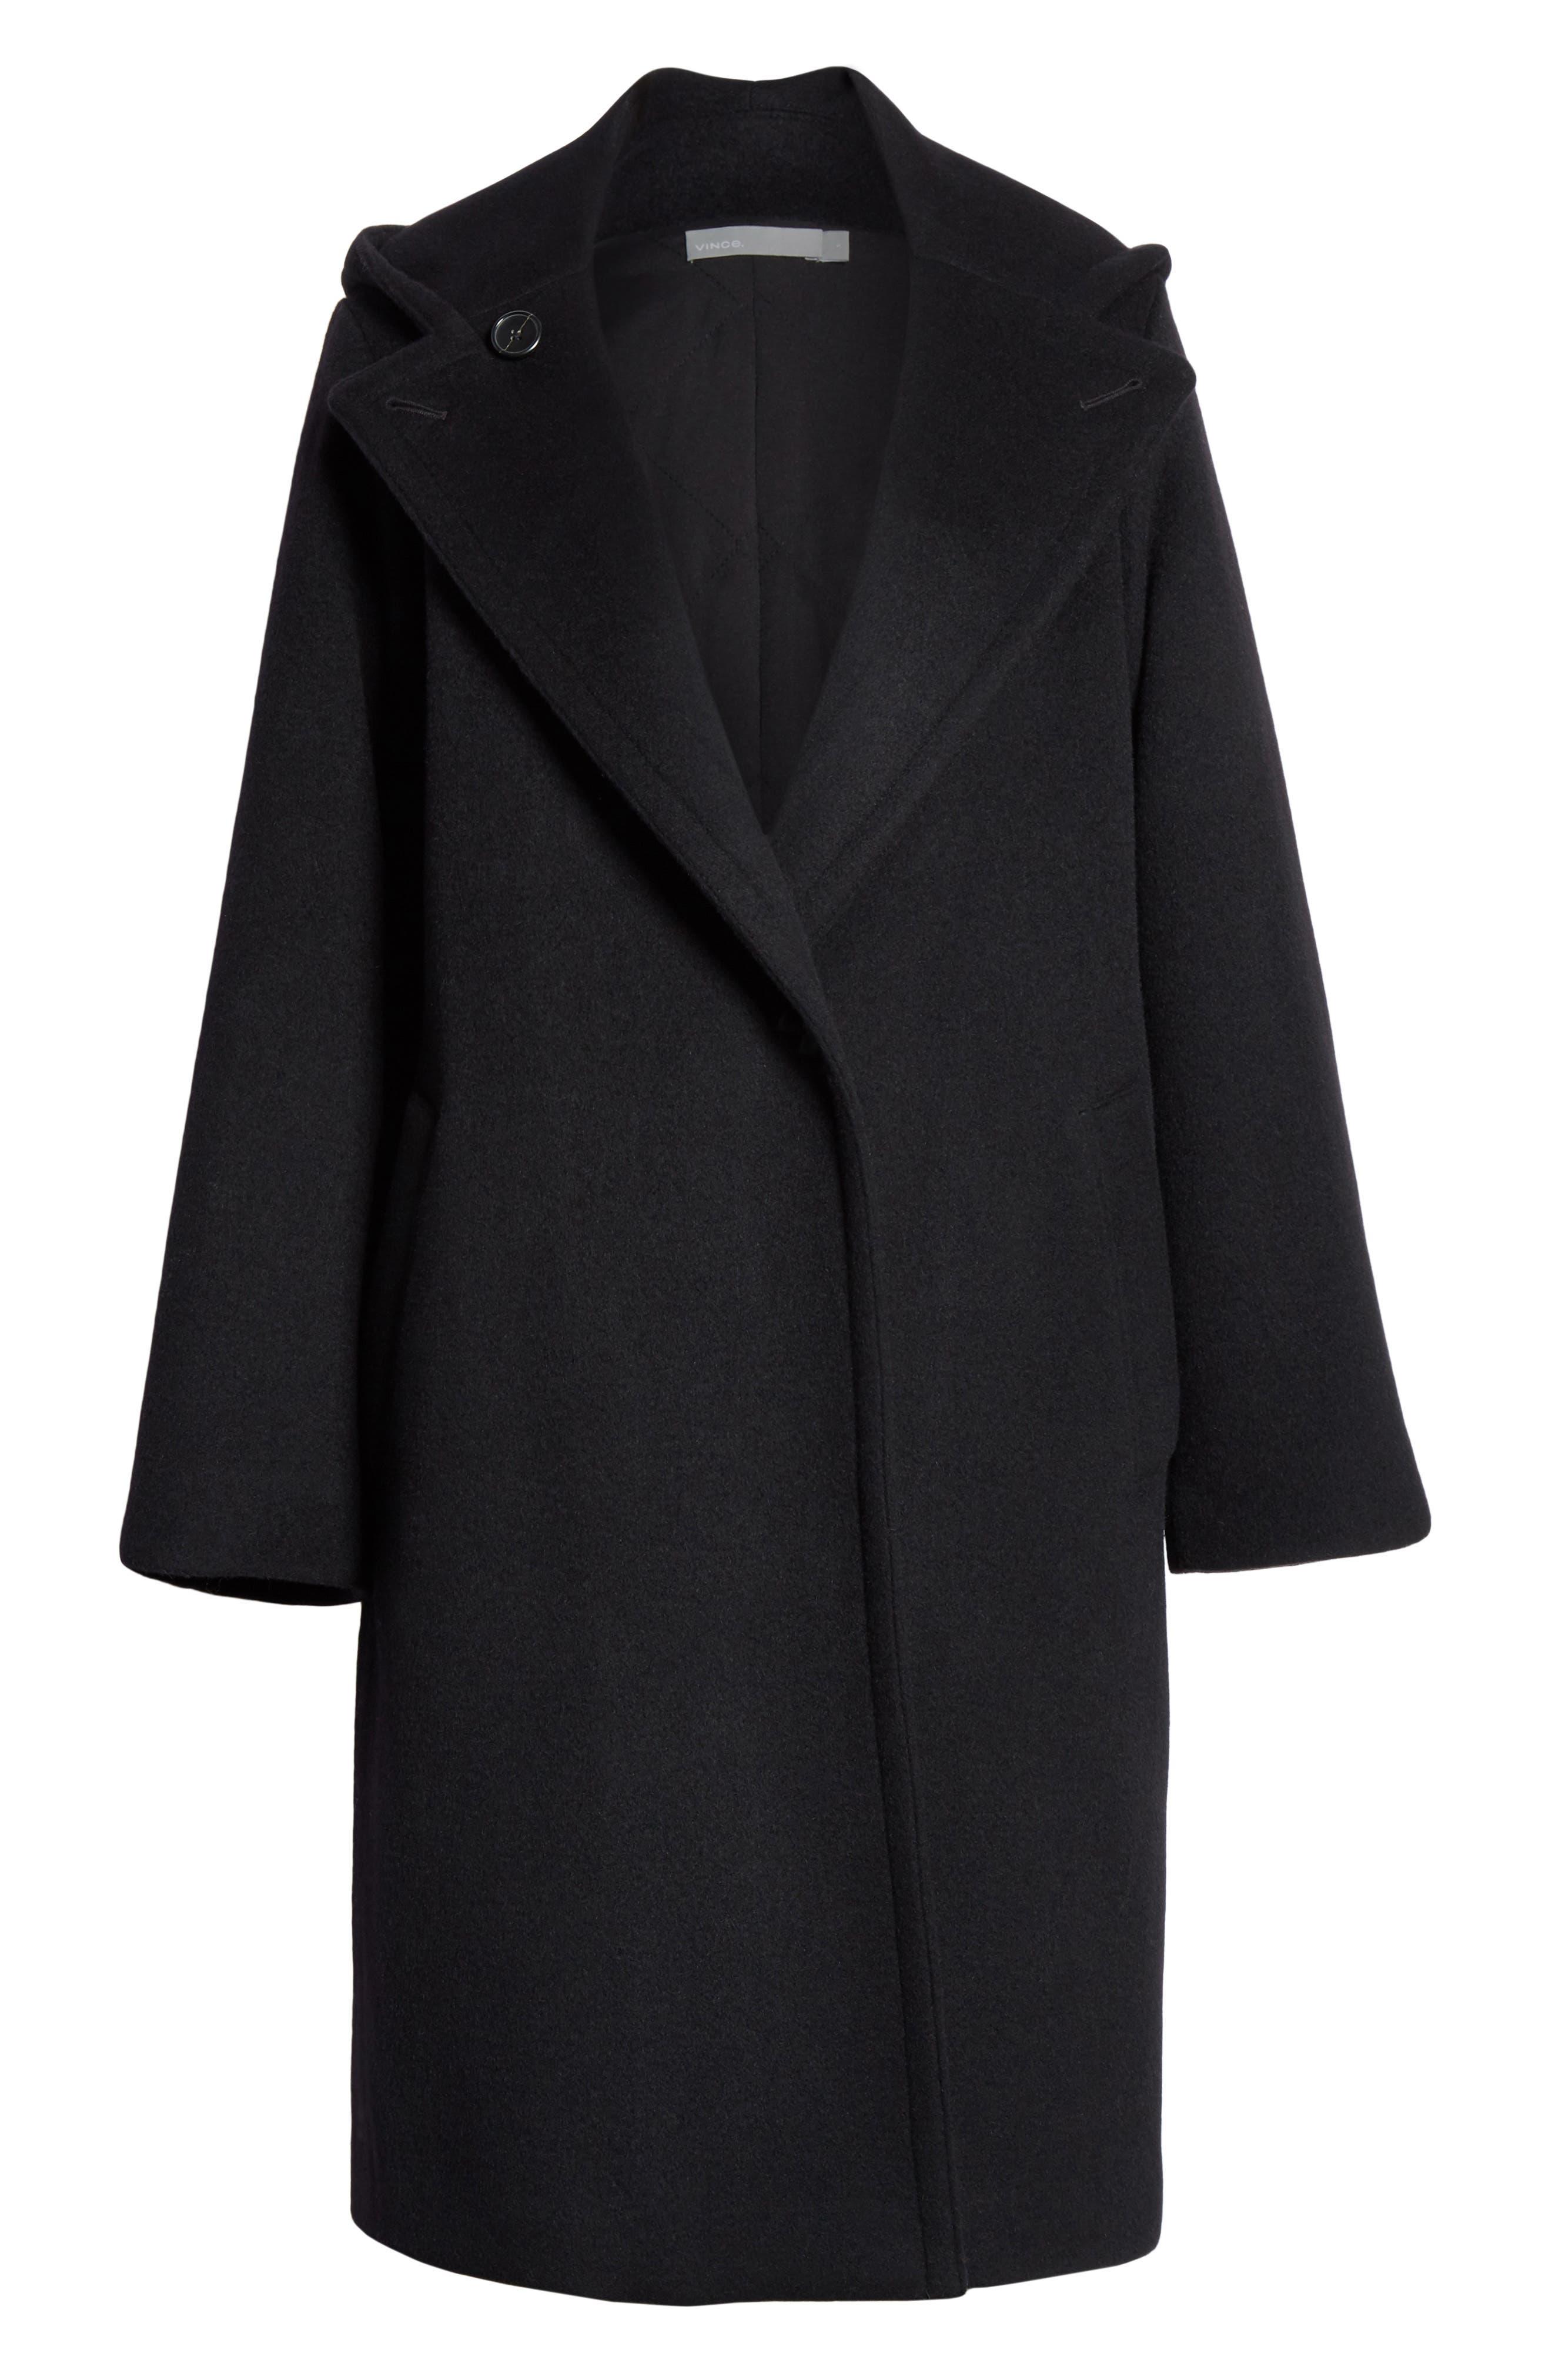 VINCE,                             Hooded Coat,                             Alternate thumbnail 5, color,                             BLACK